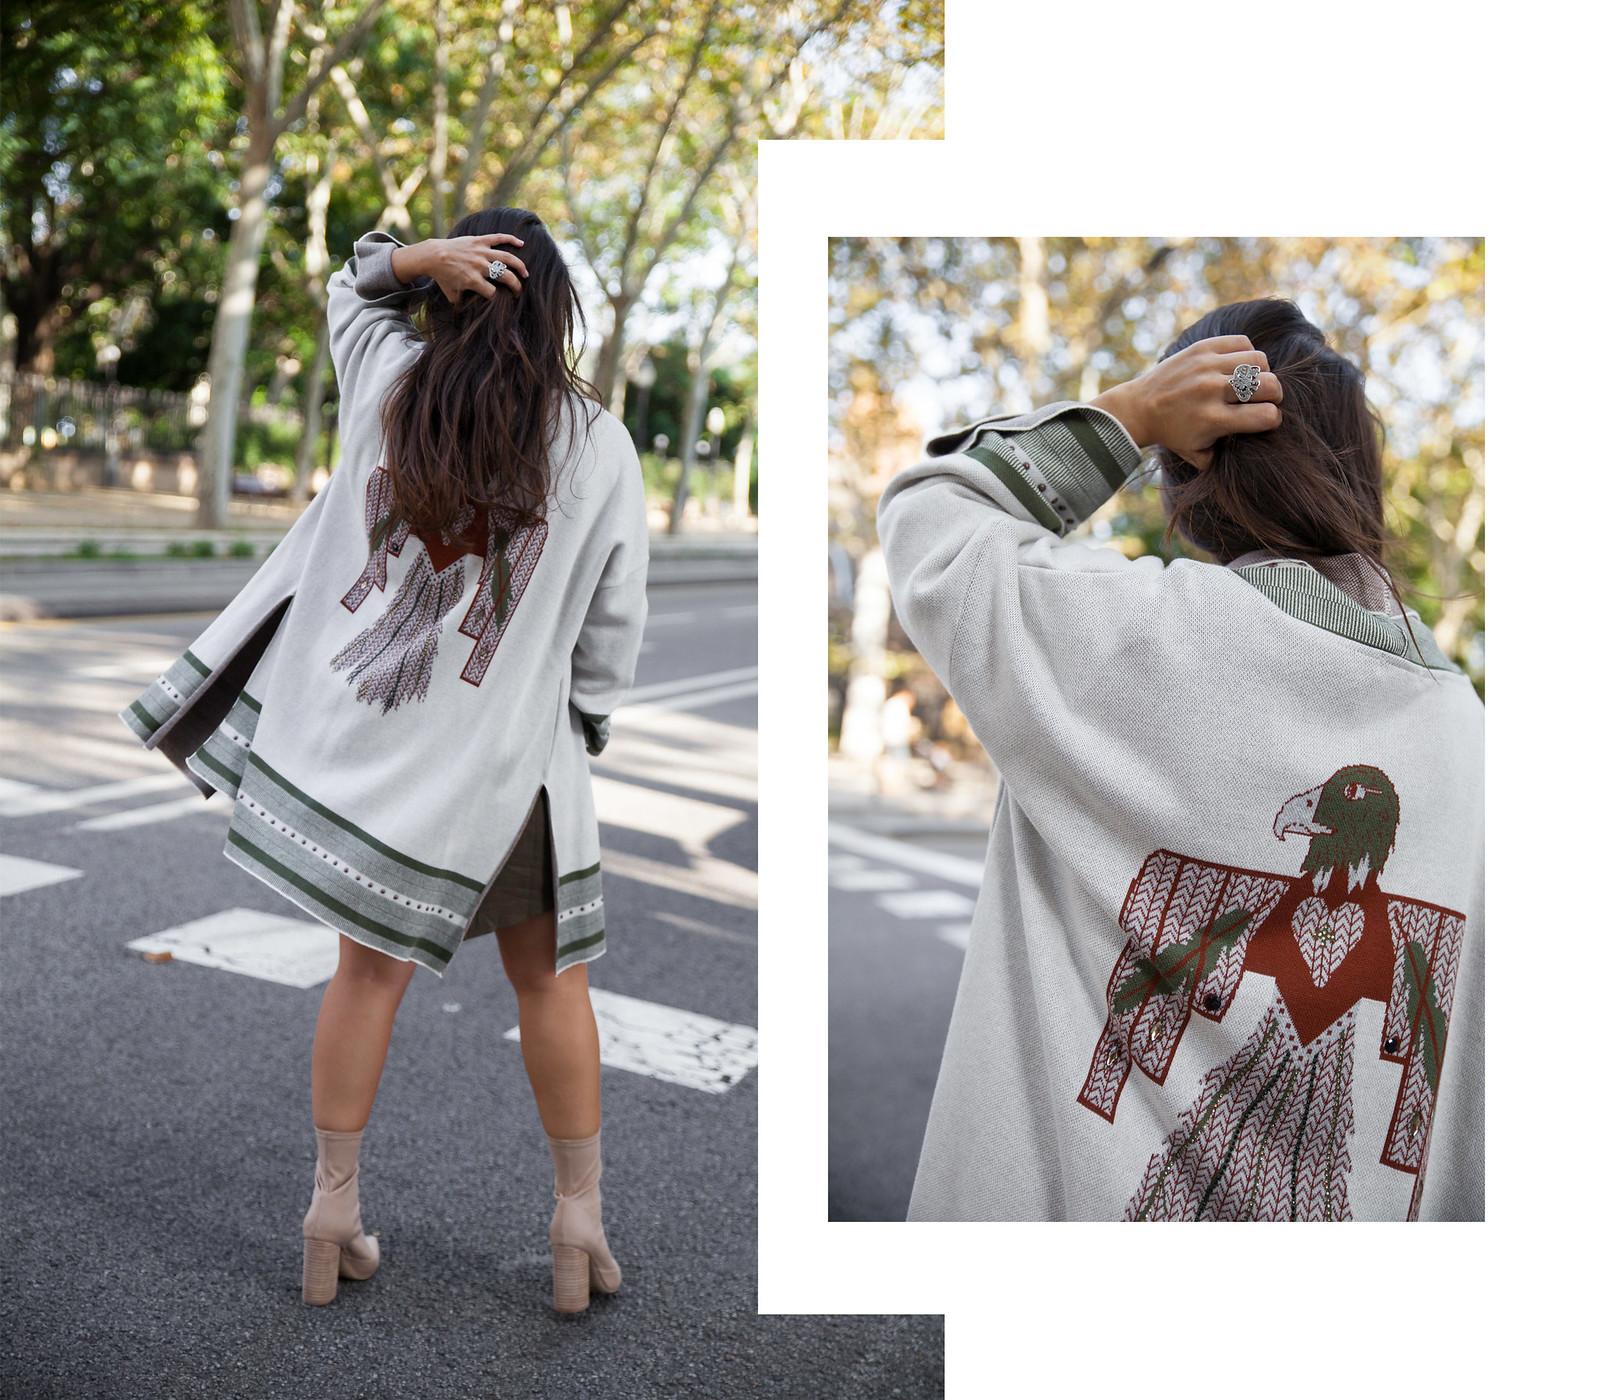 09_Como_combinar_un_cardigan_khaki_etnico_otoño_theguestgirl_rüga_laura_santolaira_influencer_embarazada_fashion_street_style_barcelona